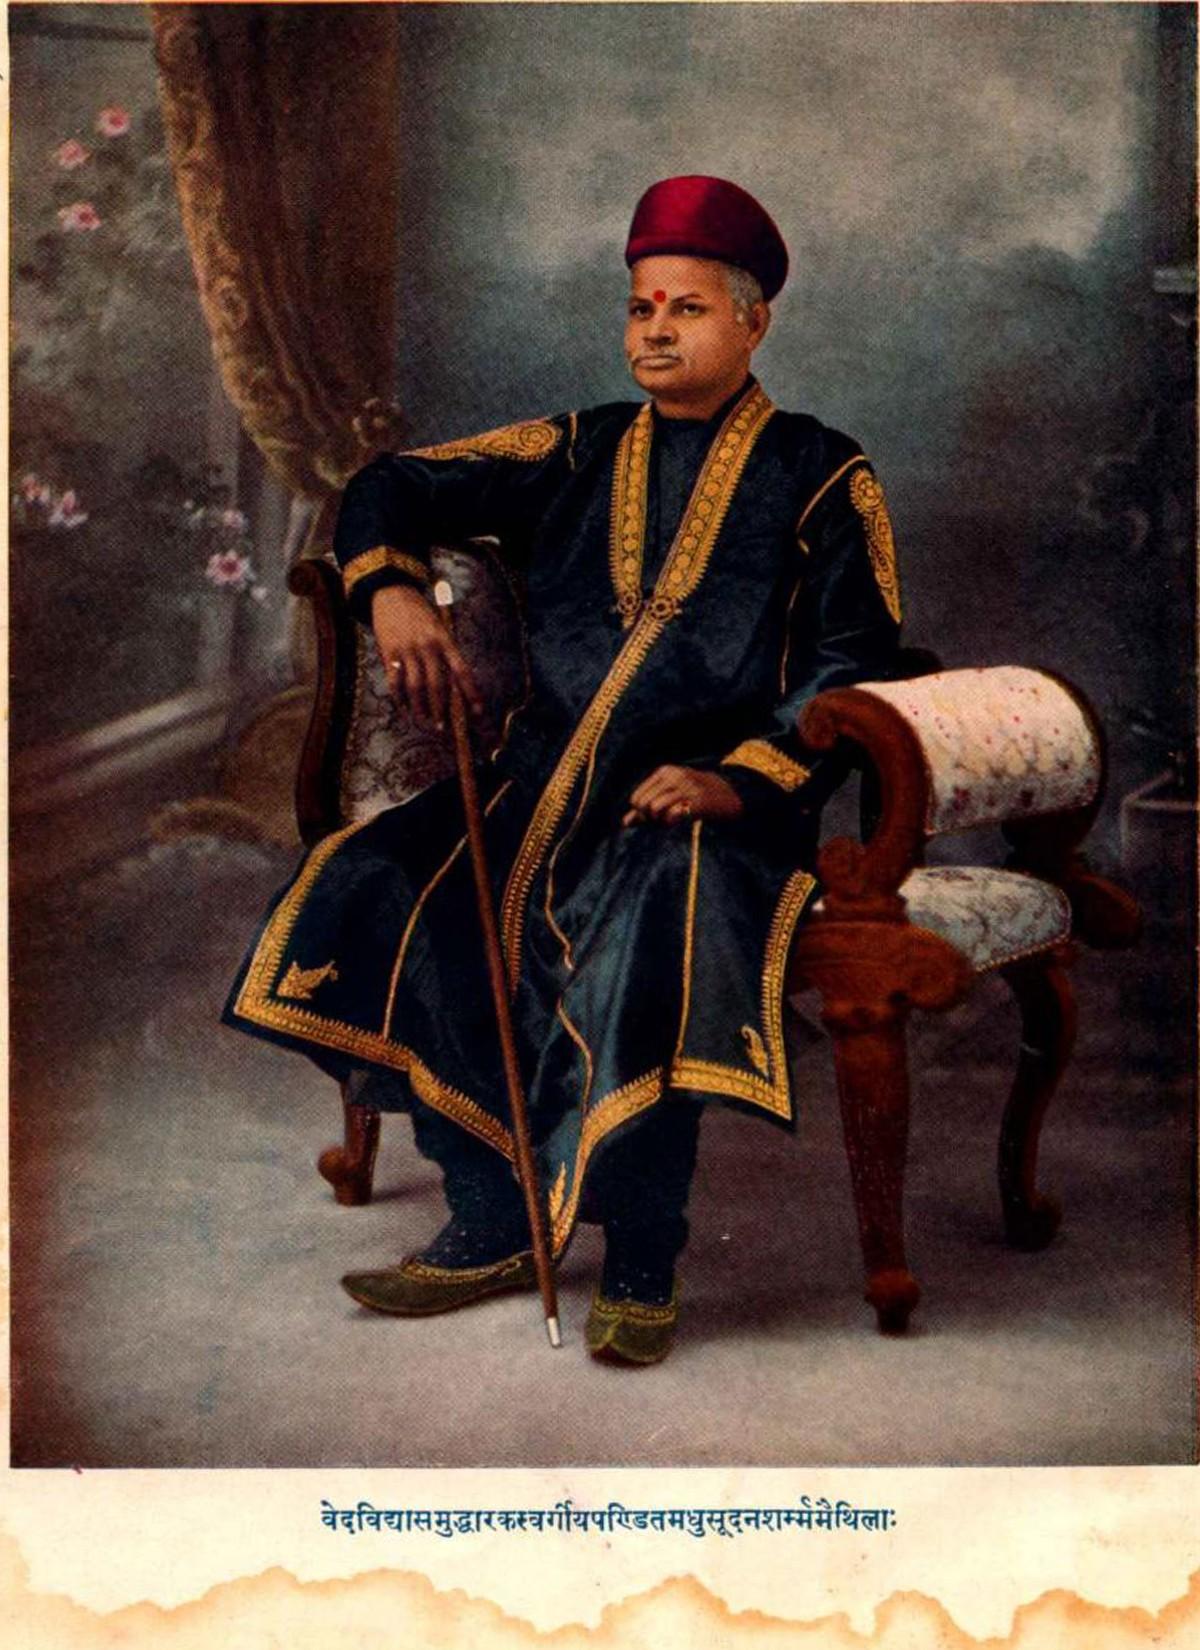 Madhusudan Ojha from Mithila